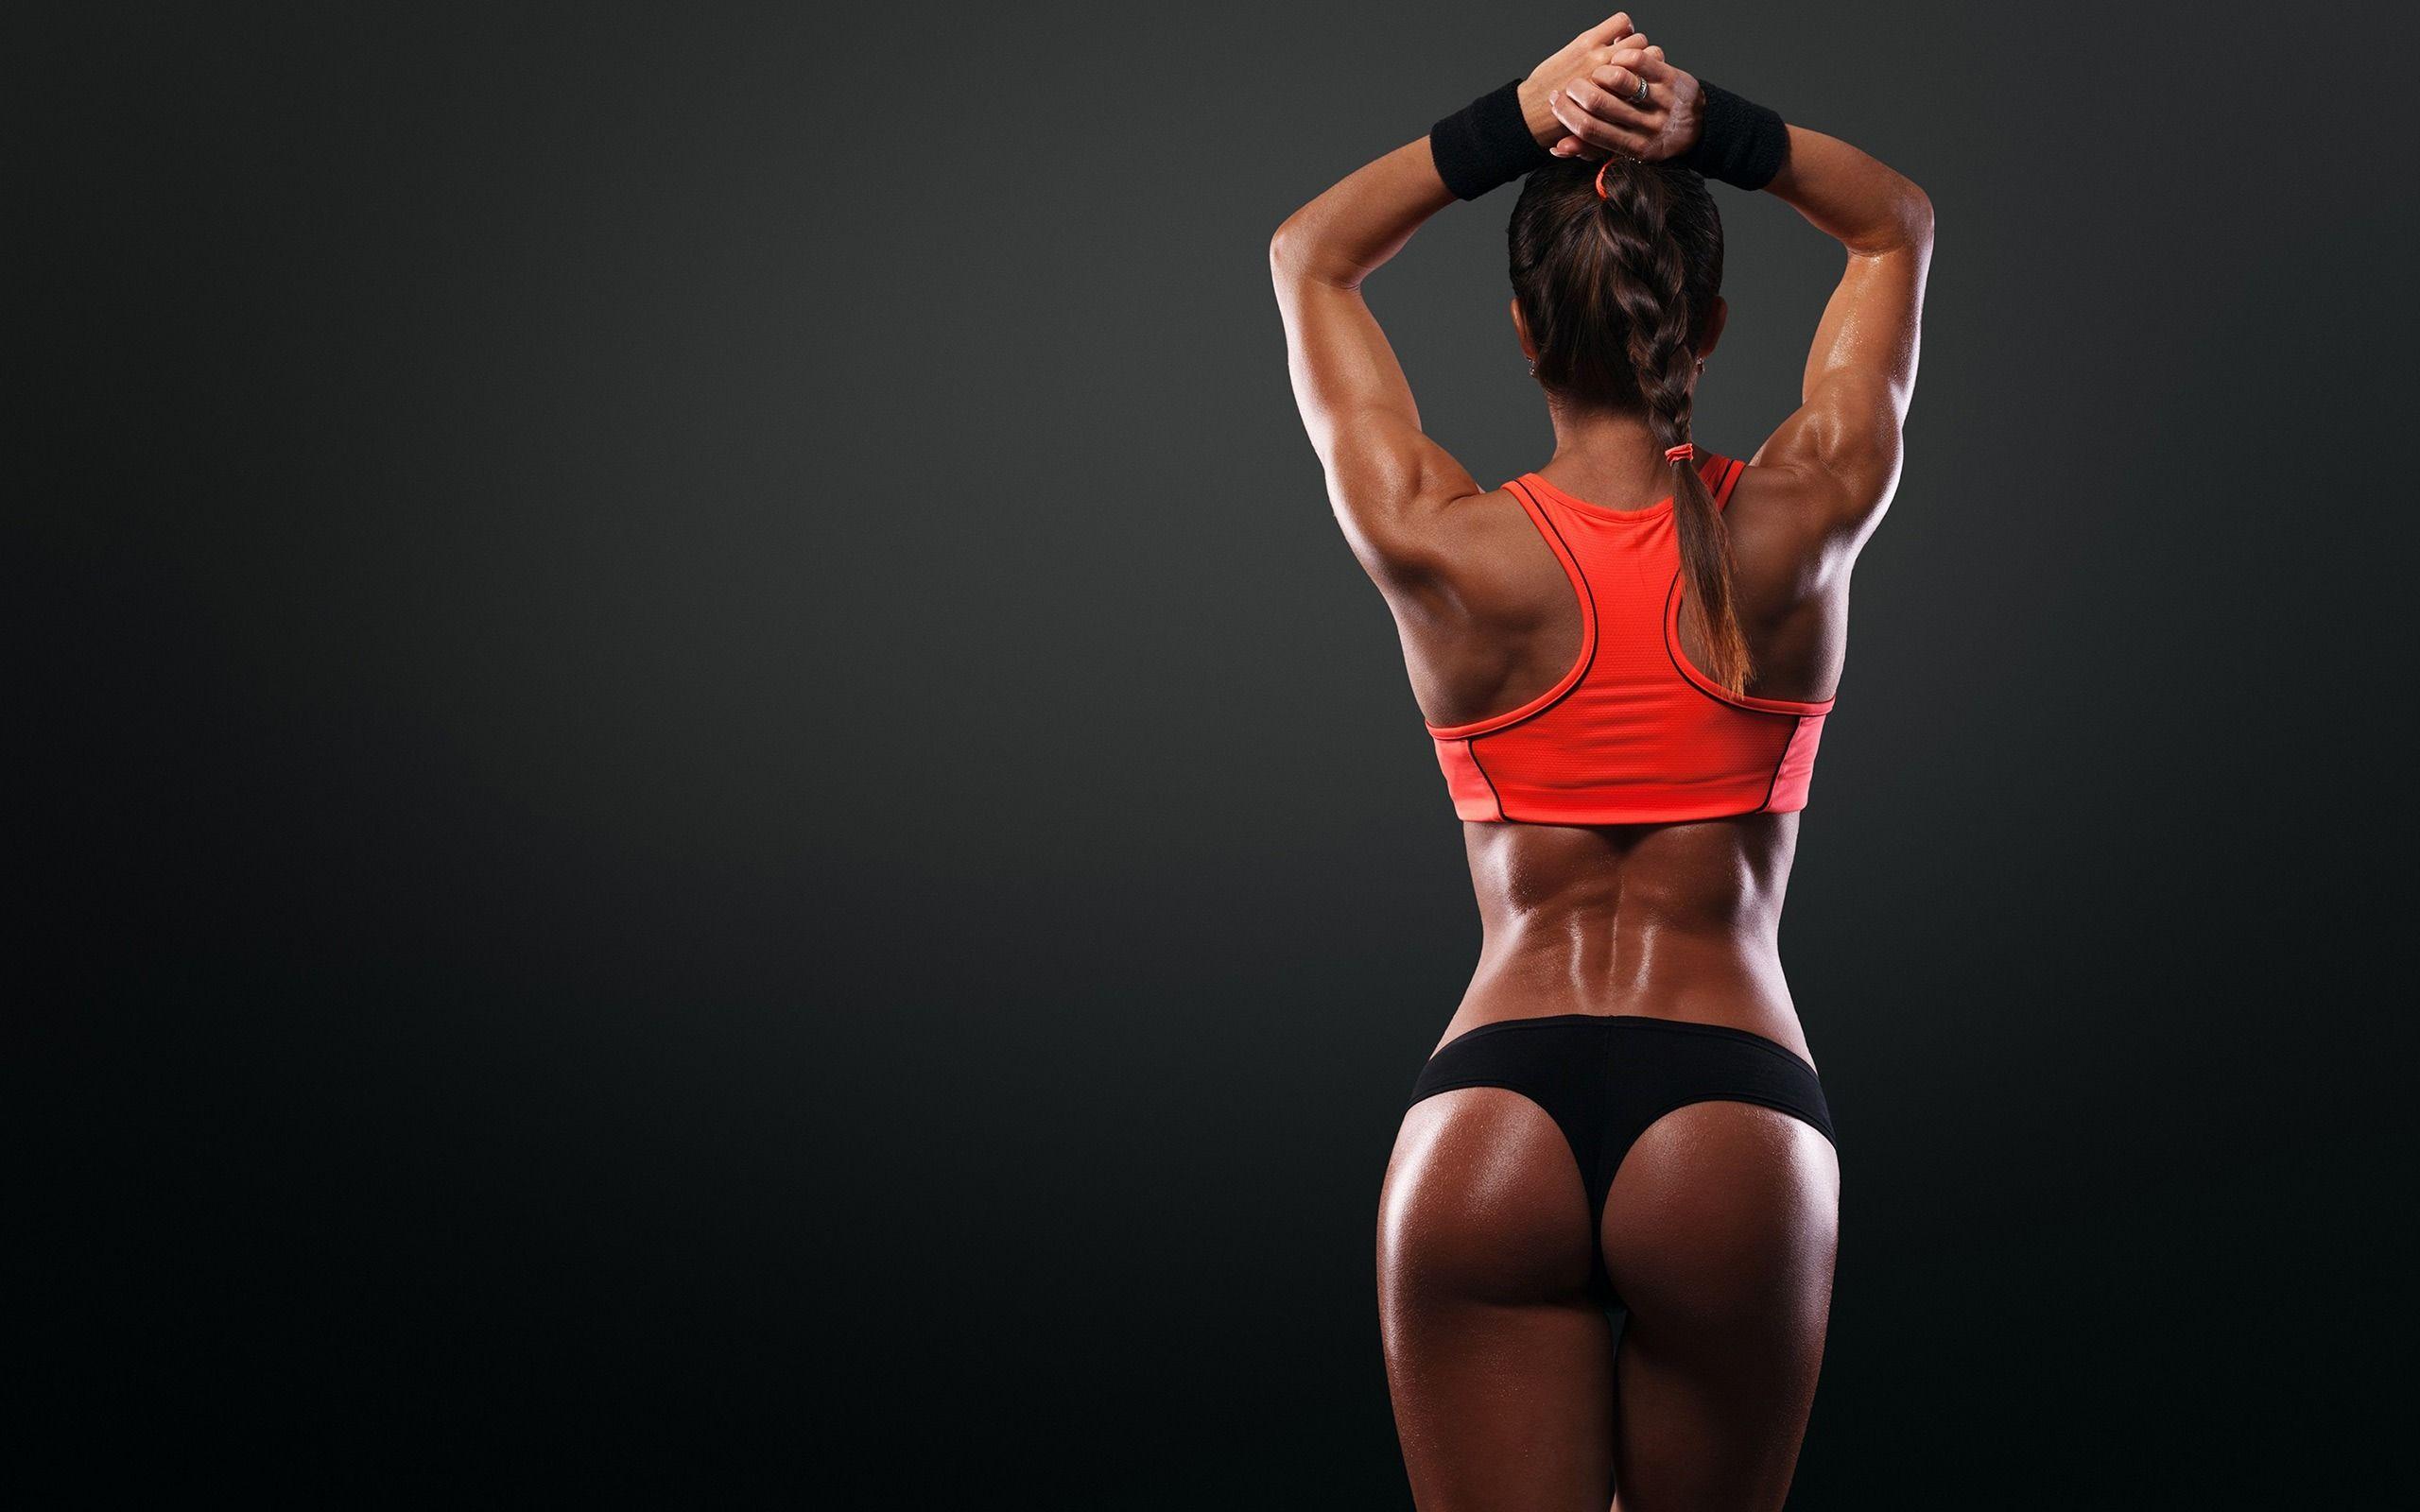 sexy gym girl wallpaper 1865 2560 x 1600